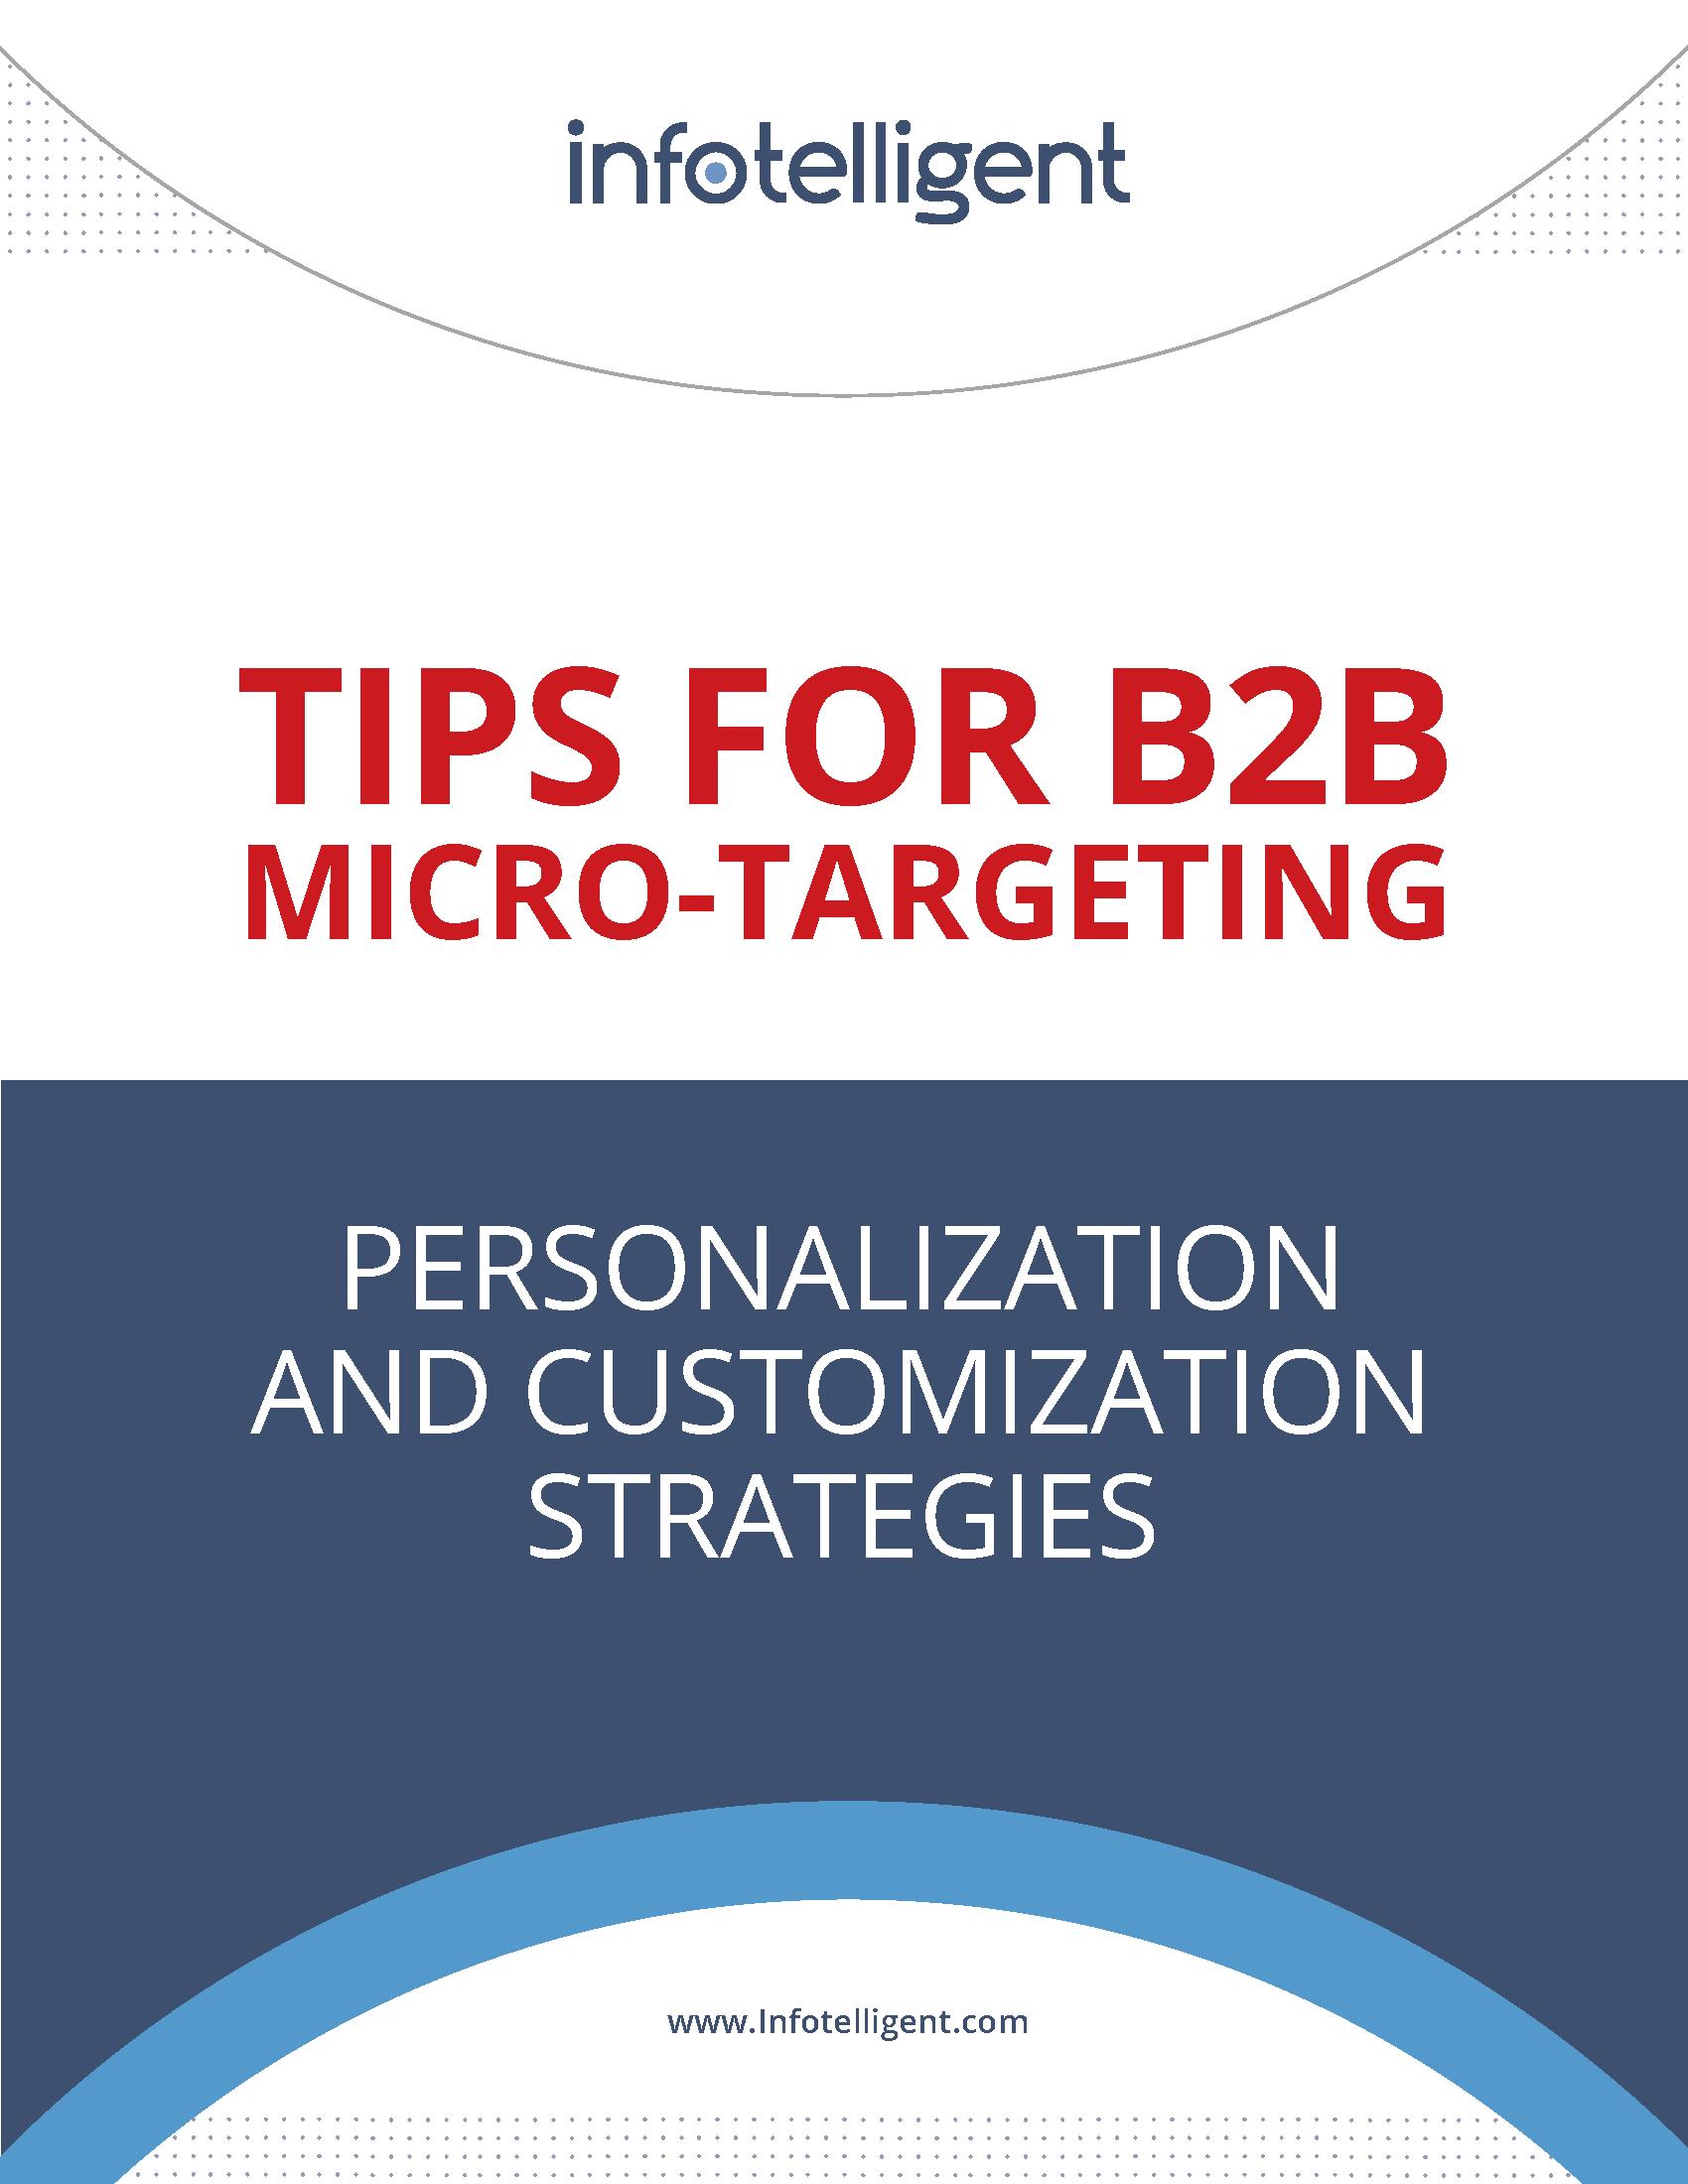 Tips for B2B Micro-Targeting